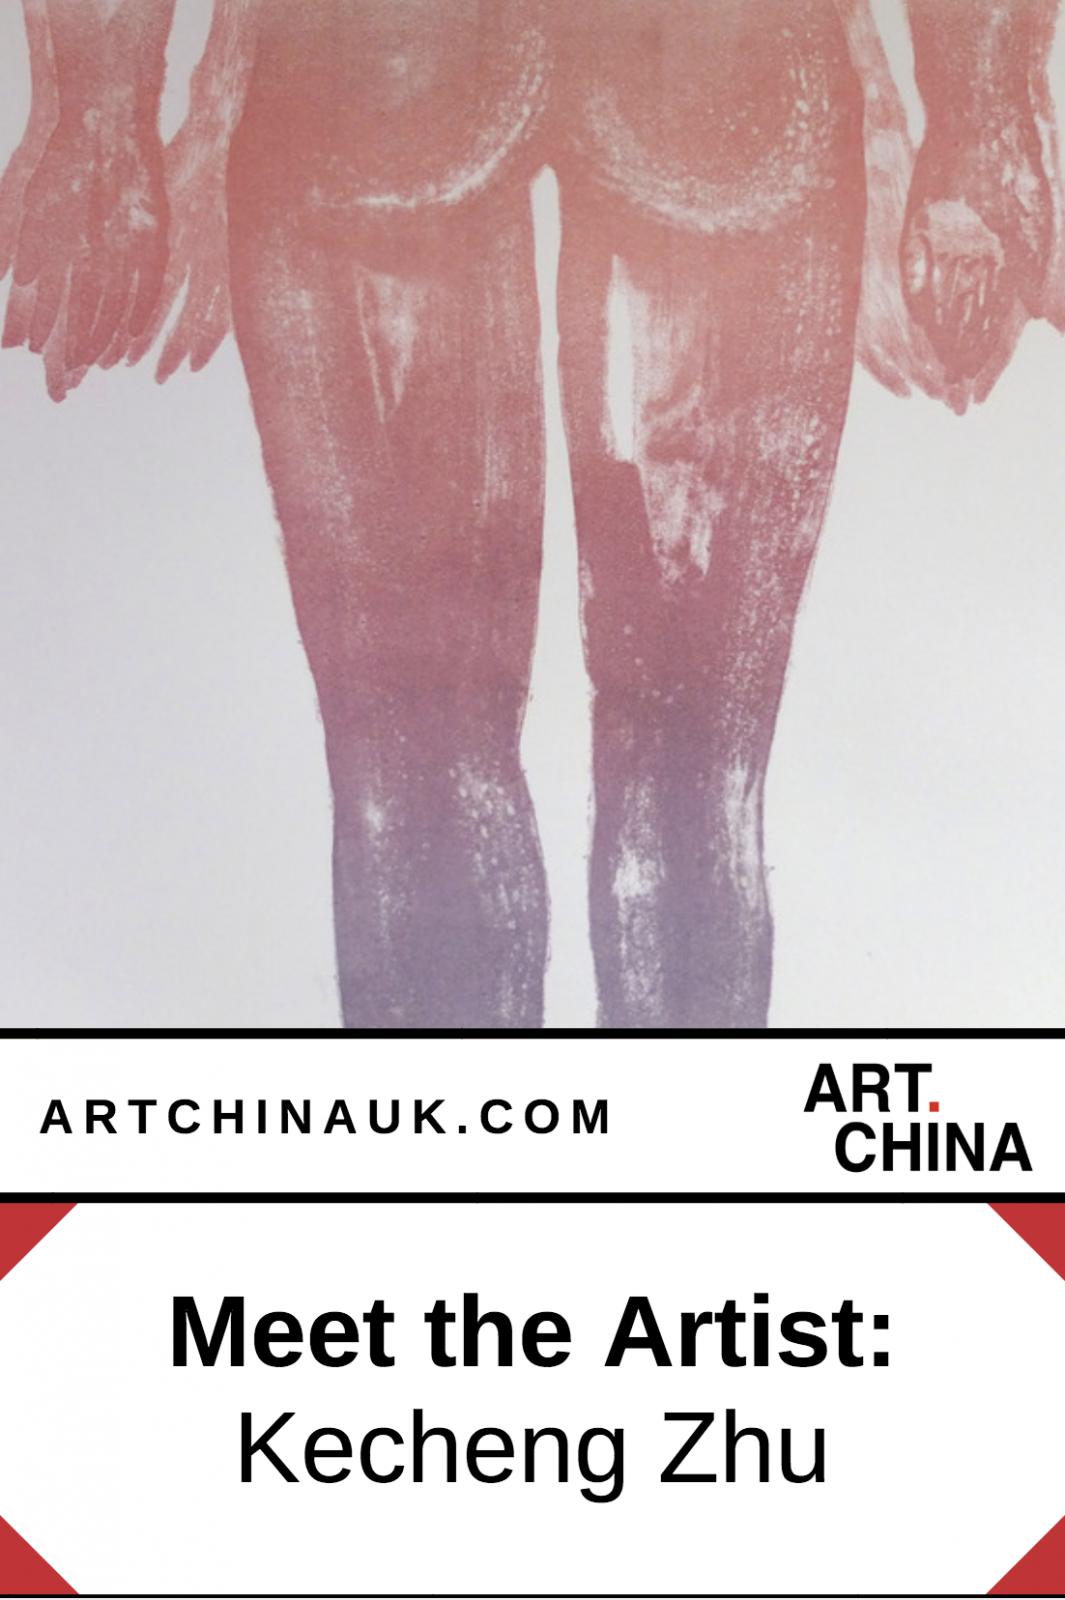 Meet the Artist: Kecheng Zhu (Stone Lithograph Prints)